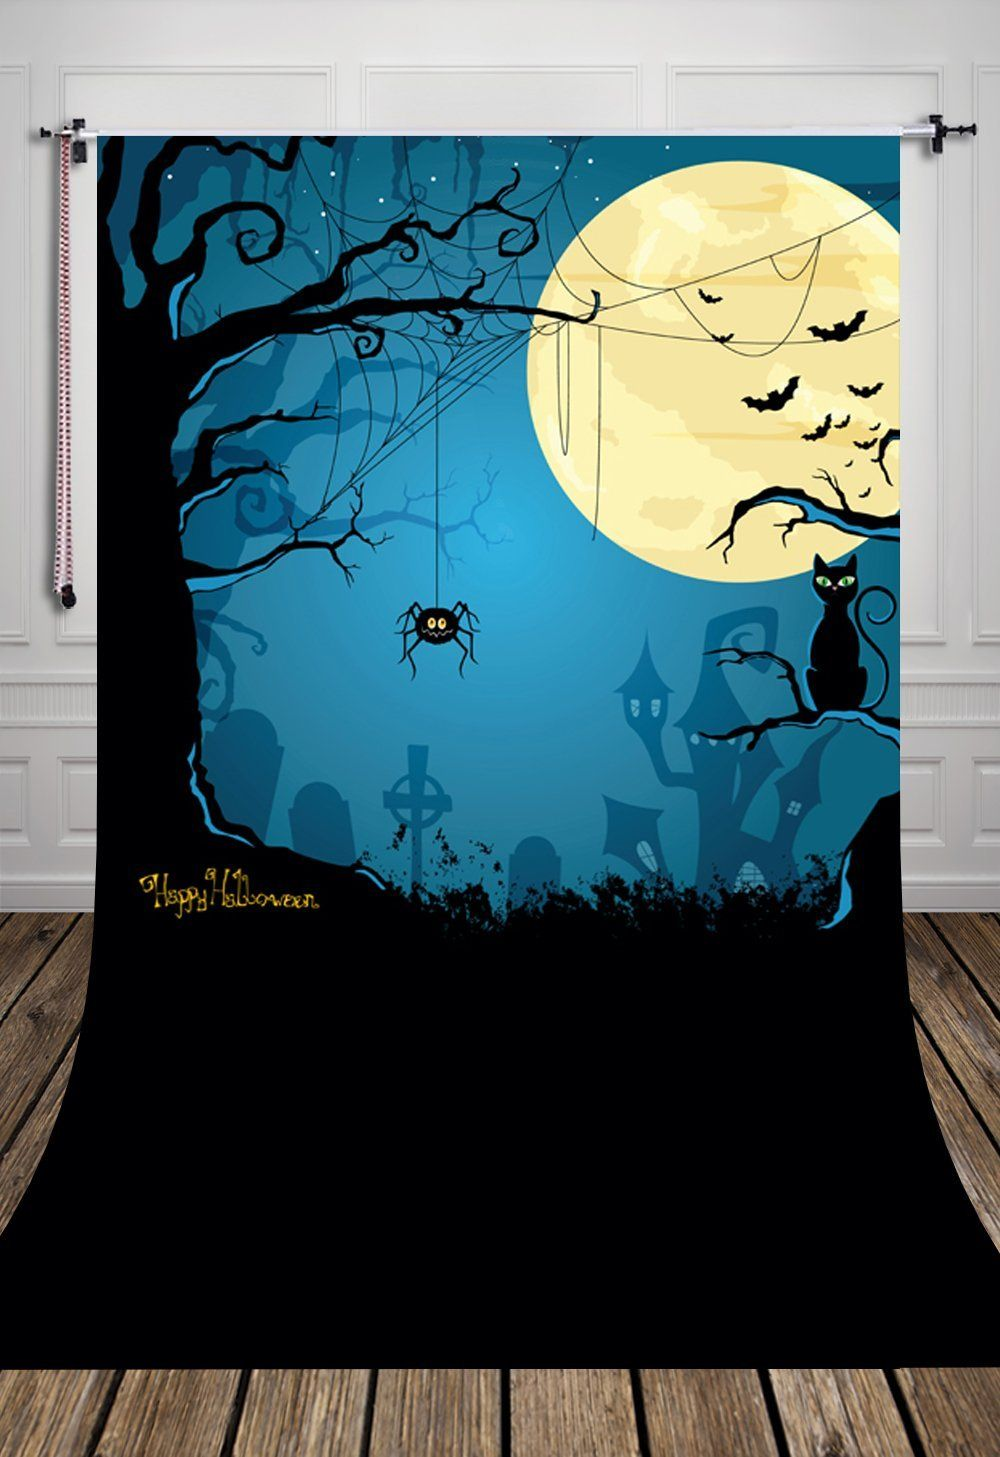 amazoncom huayi 5x10ft happy halloween backdrop canvas newborn backdrop